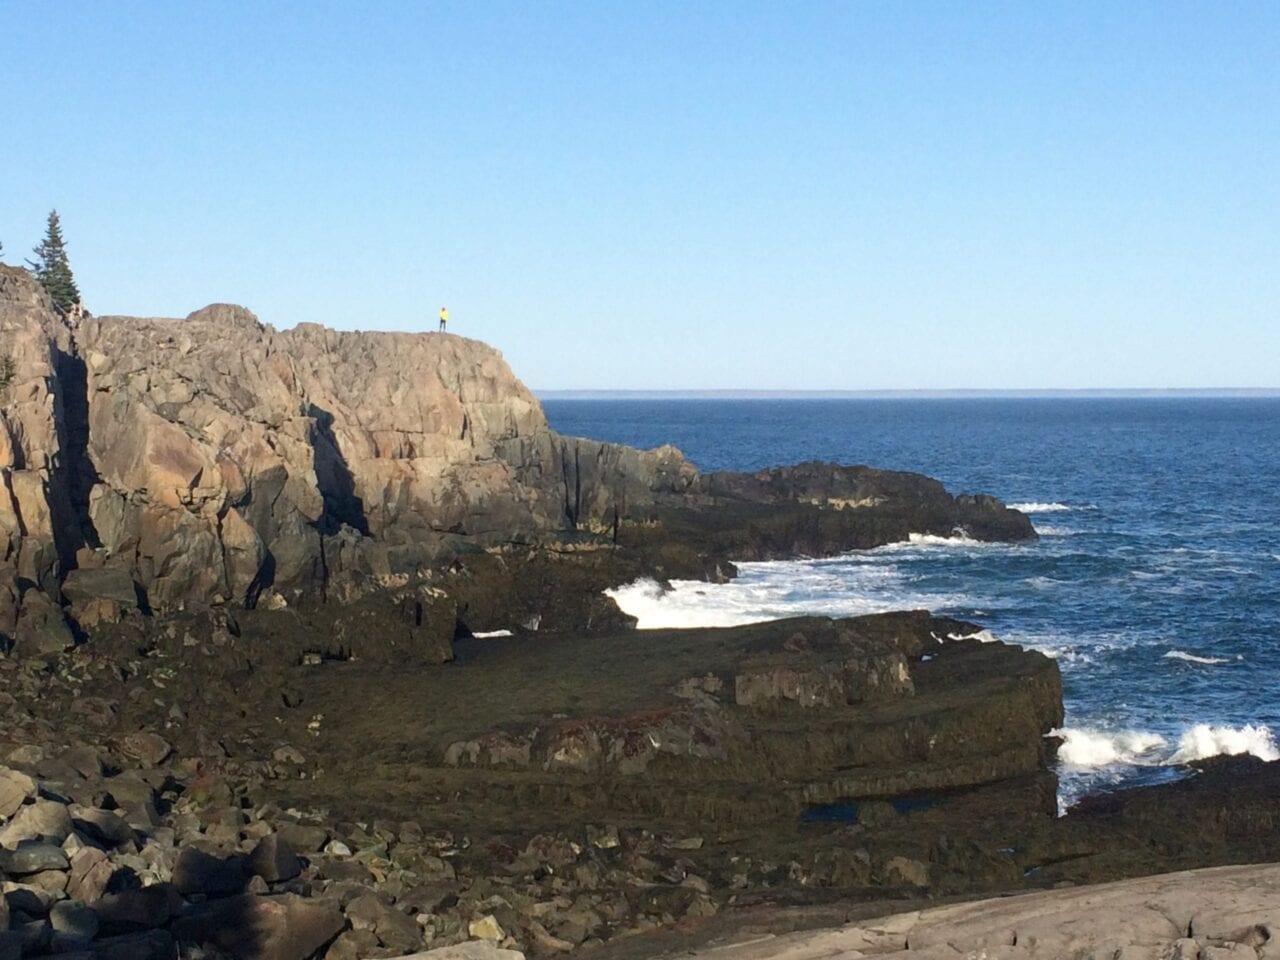 Blue skies and water meet a rocky coastline.